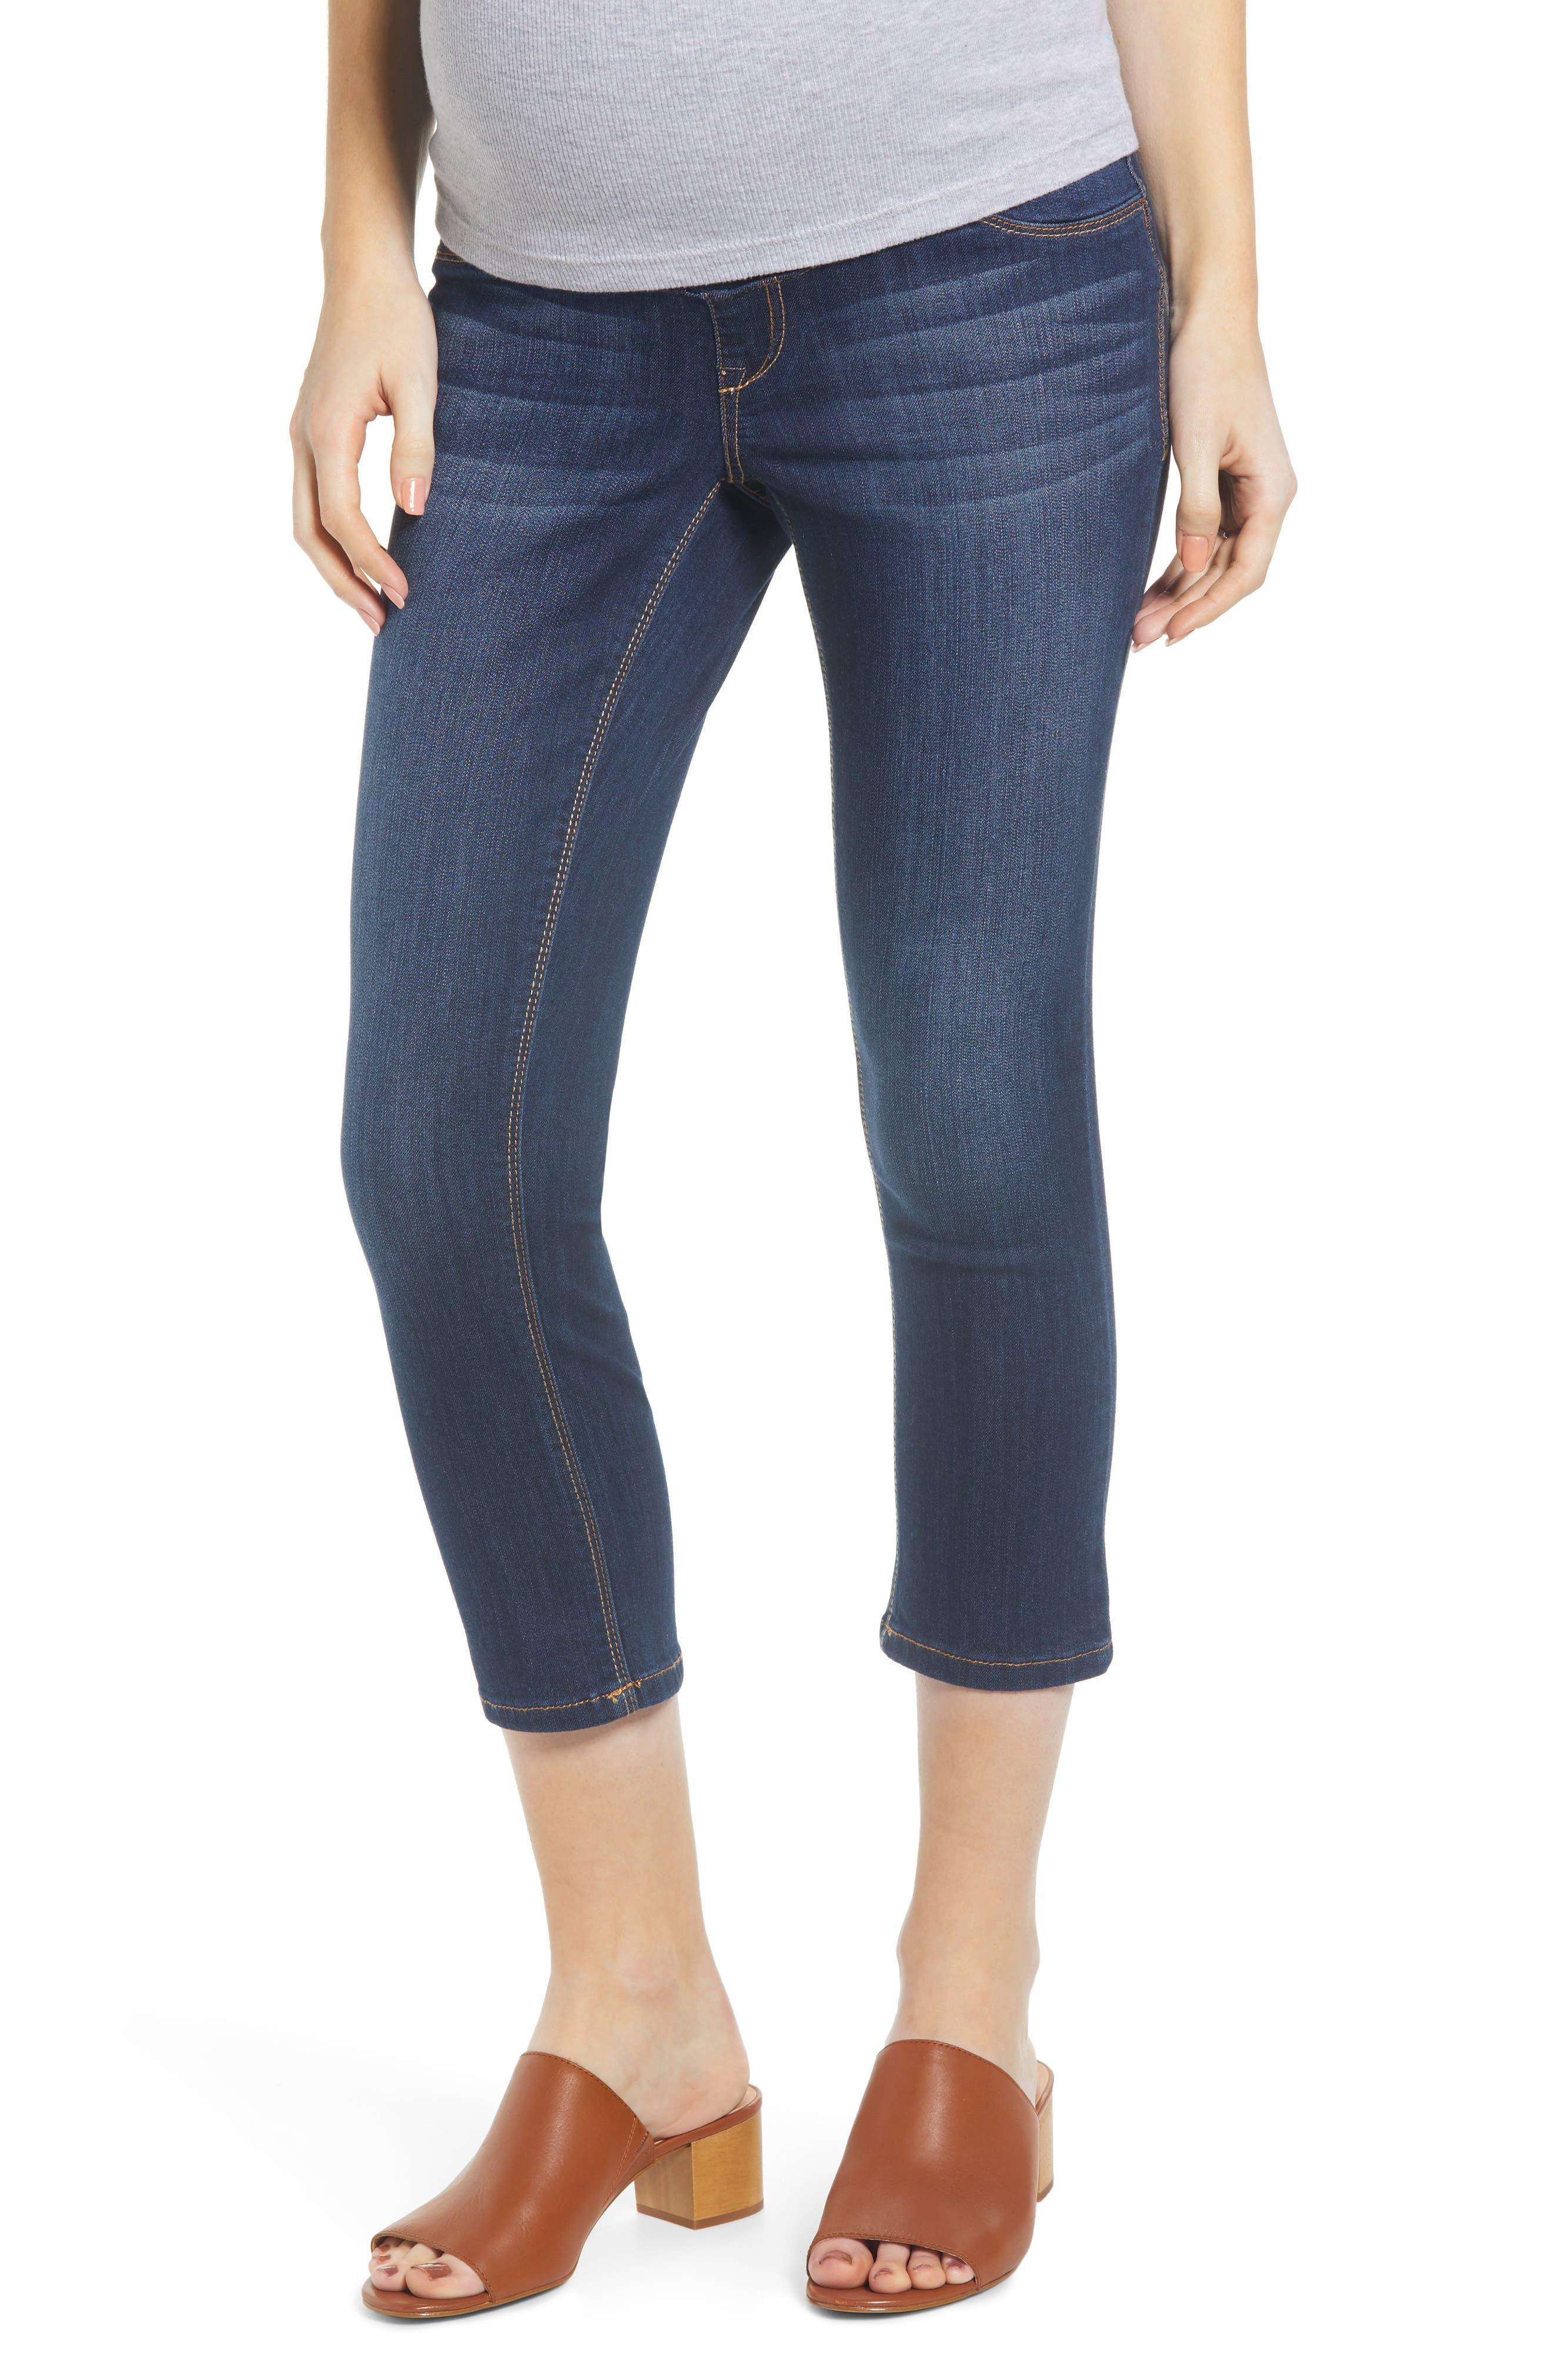 Women's 1822 Denim Crop Maternity Skinny Jeans